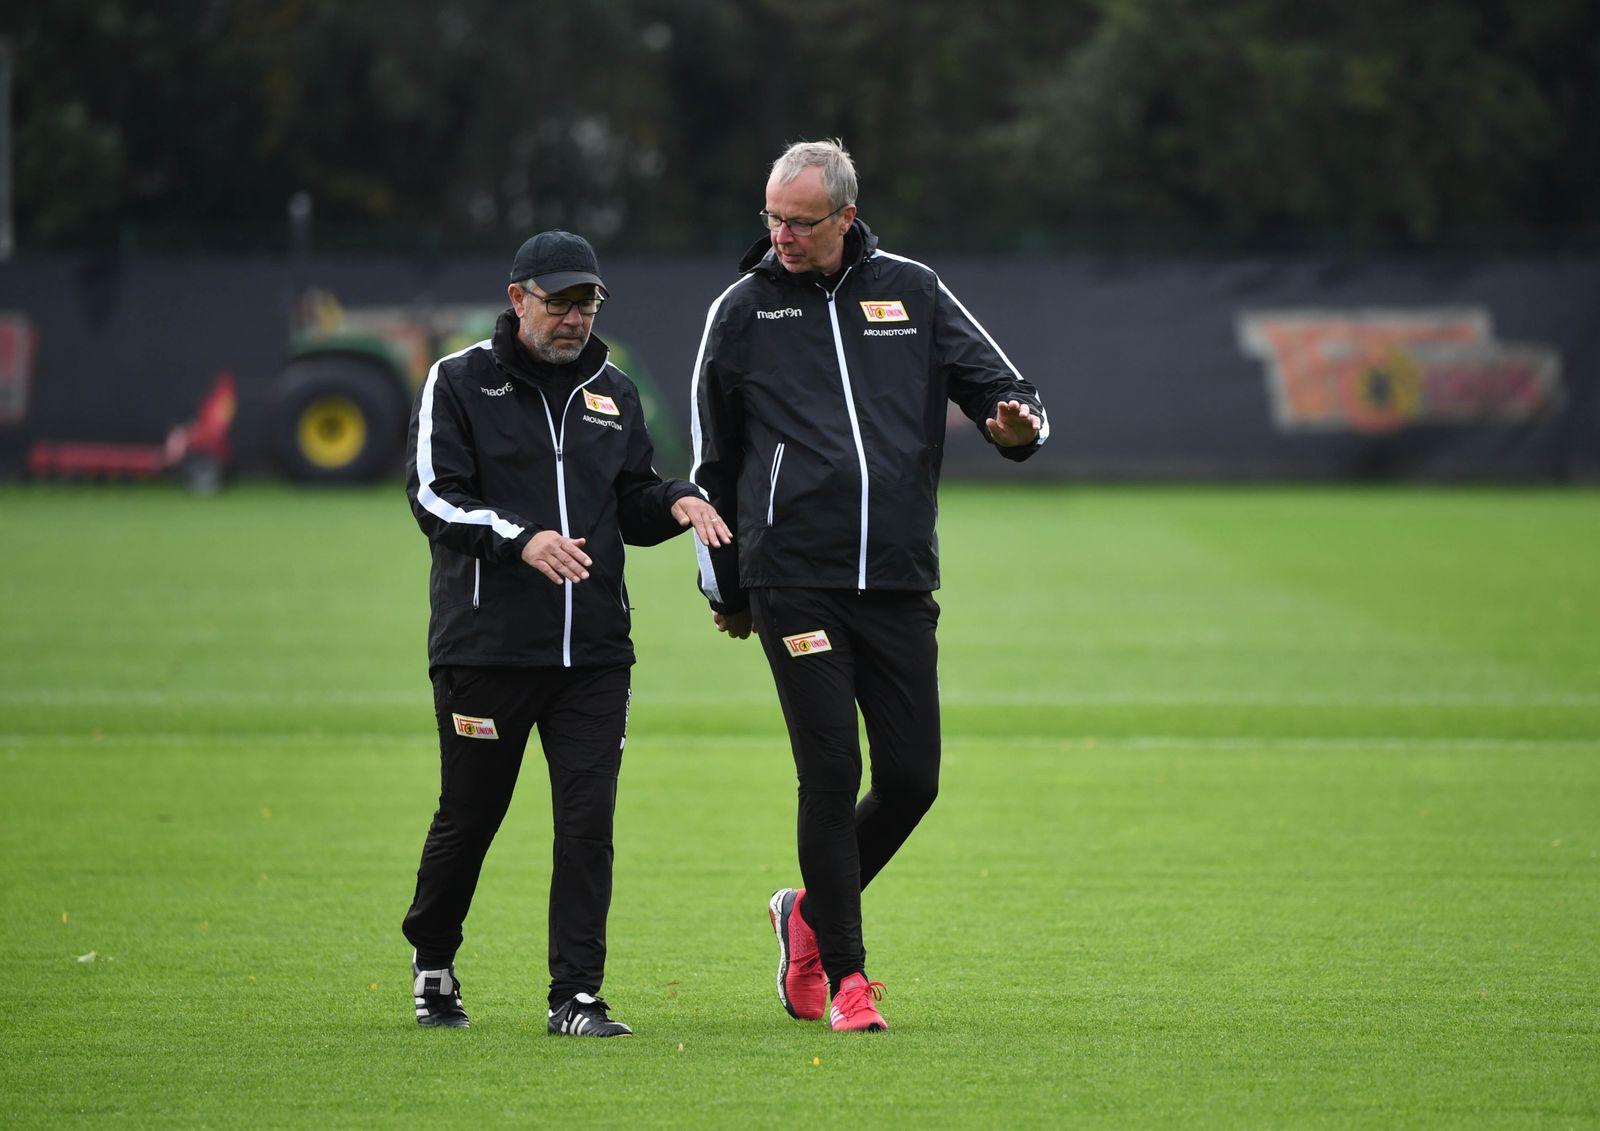 Fussball, Herren, Saison 2019/2020, 1. Bundesliga, 1. FC Union Berlin, Training, v. l. Trainer Urs Fischer (1. FC Union